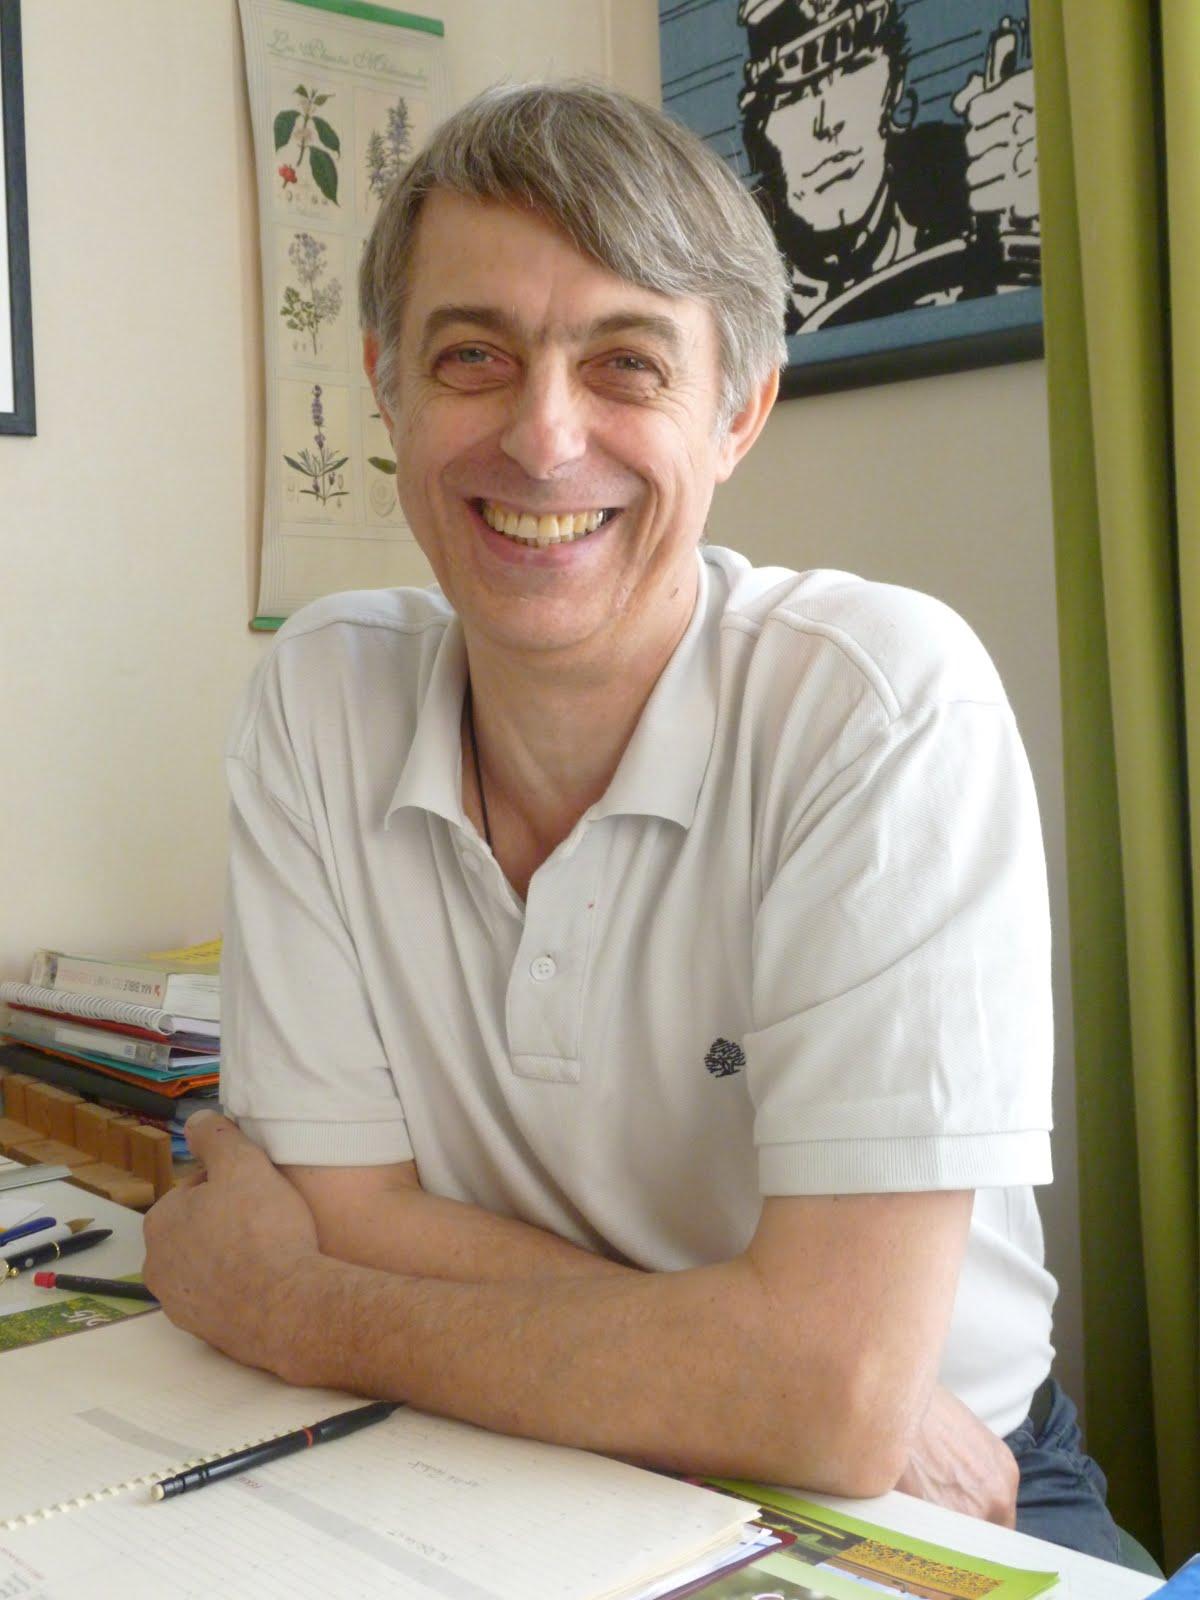 Renaud dargent